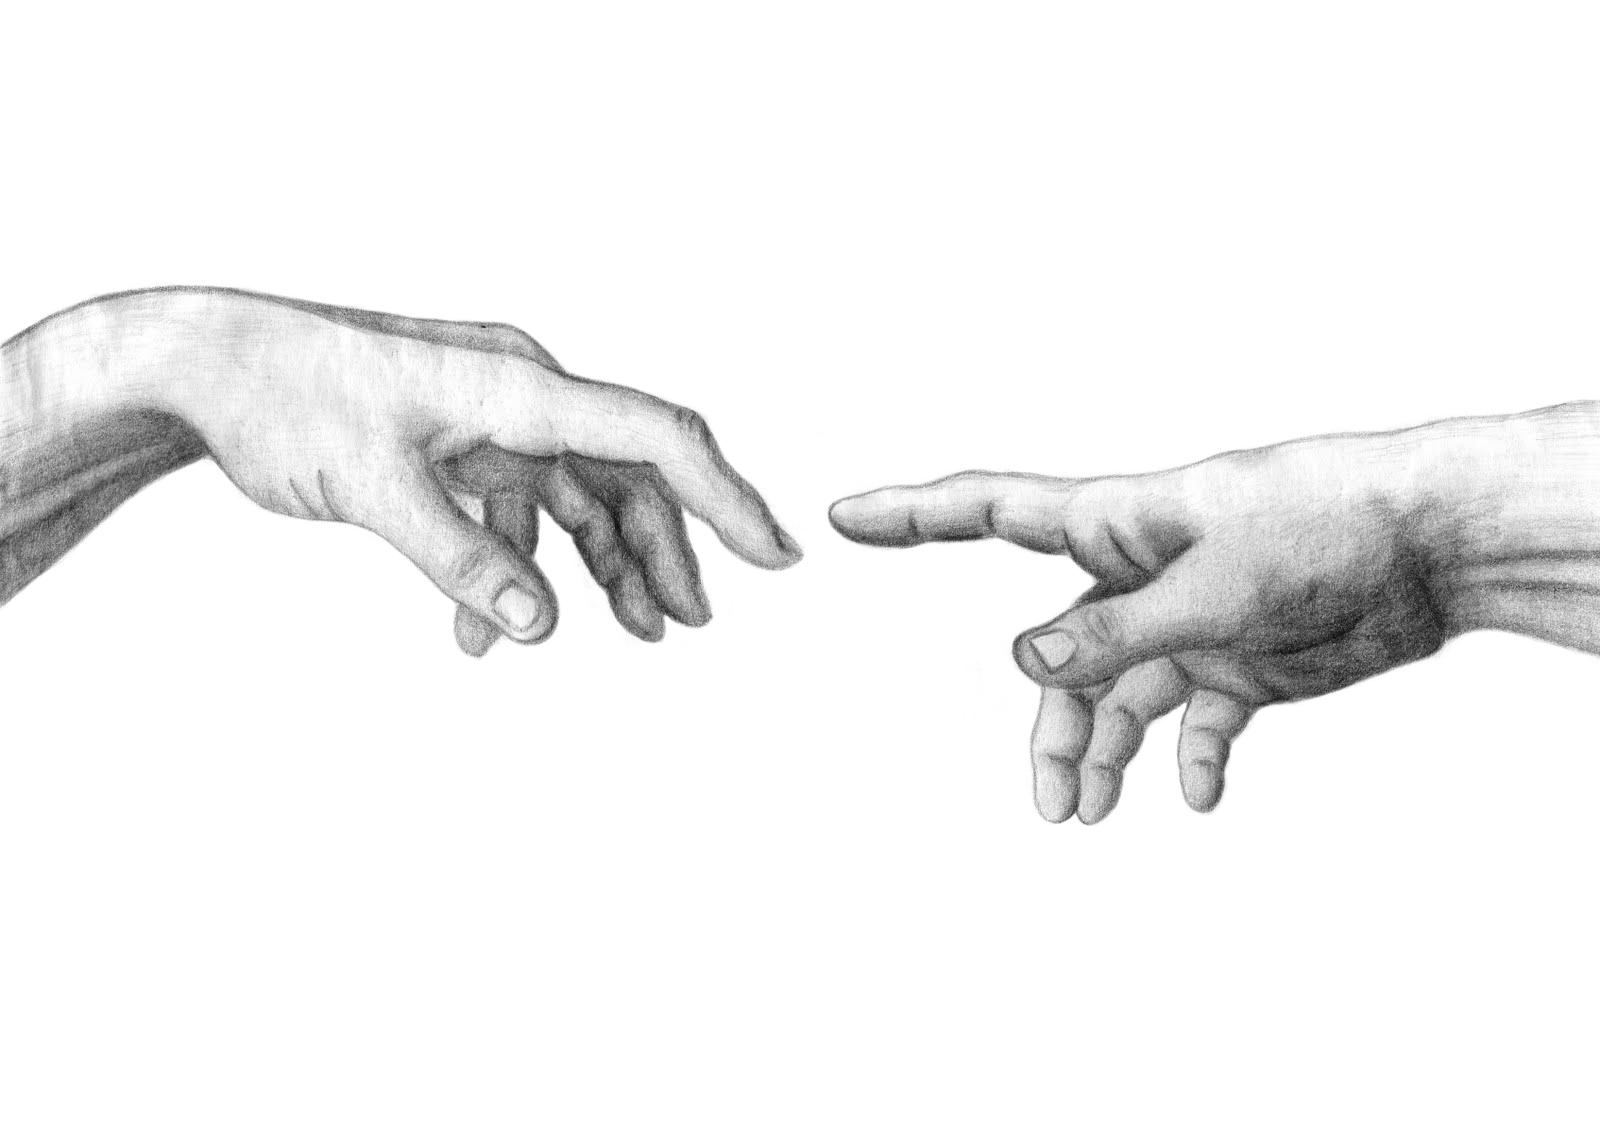 руки тянутся друг к другу картинки без фона такую краску полках